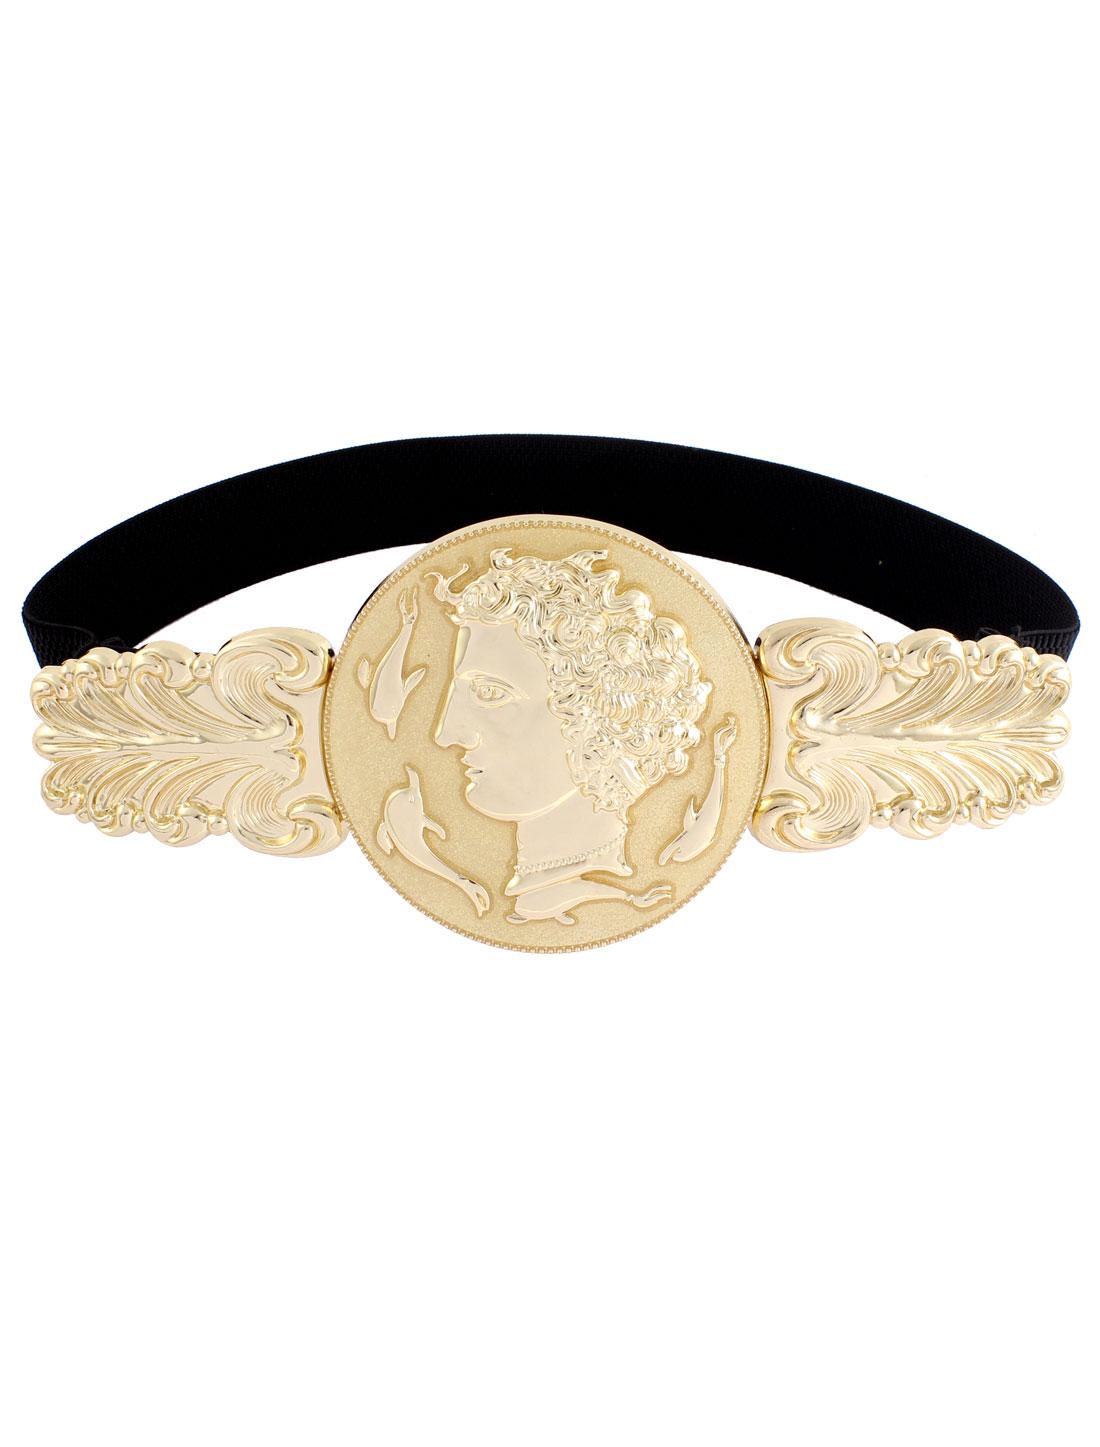 Gold Tone Queen Design Interlocking Buckle Black Cinch Belt